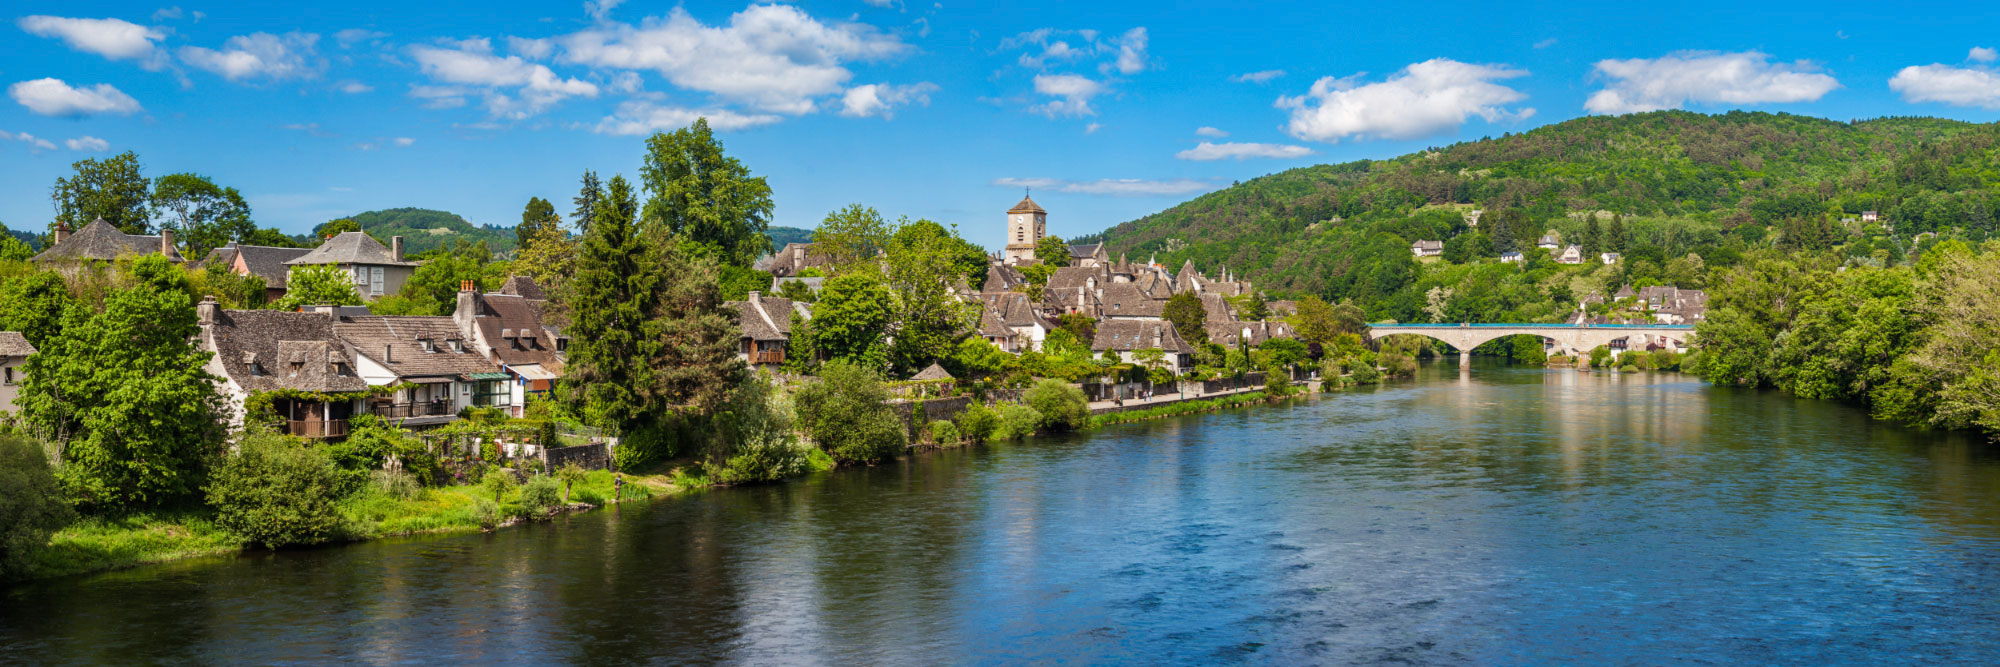 5-14934-france-correze-la-dordogne-a-argentat-panorama-sentucq-h